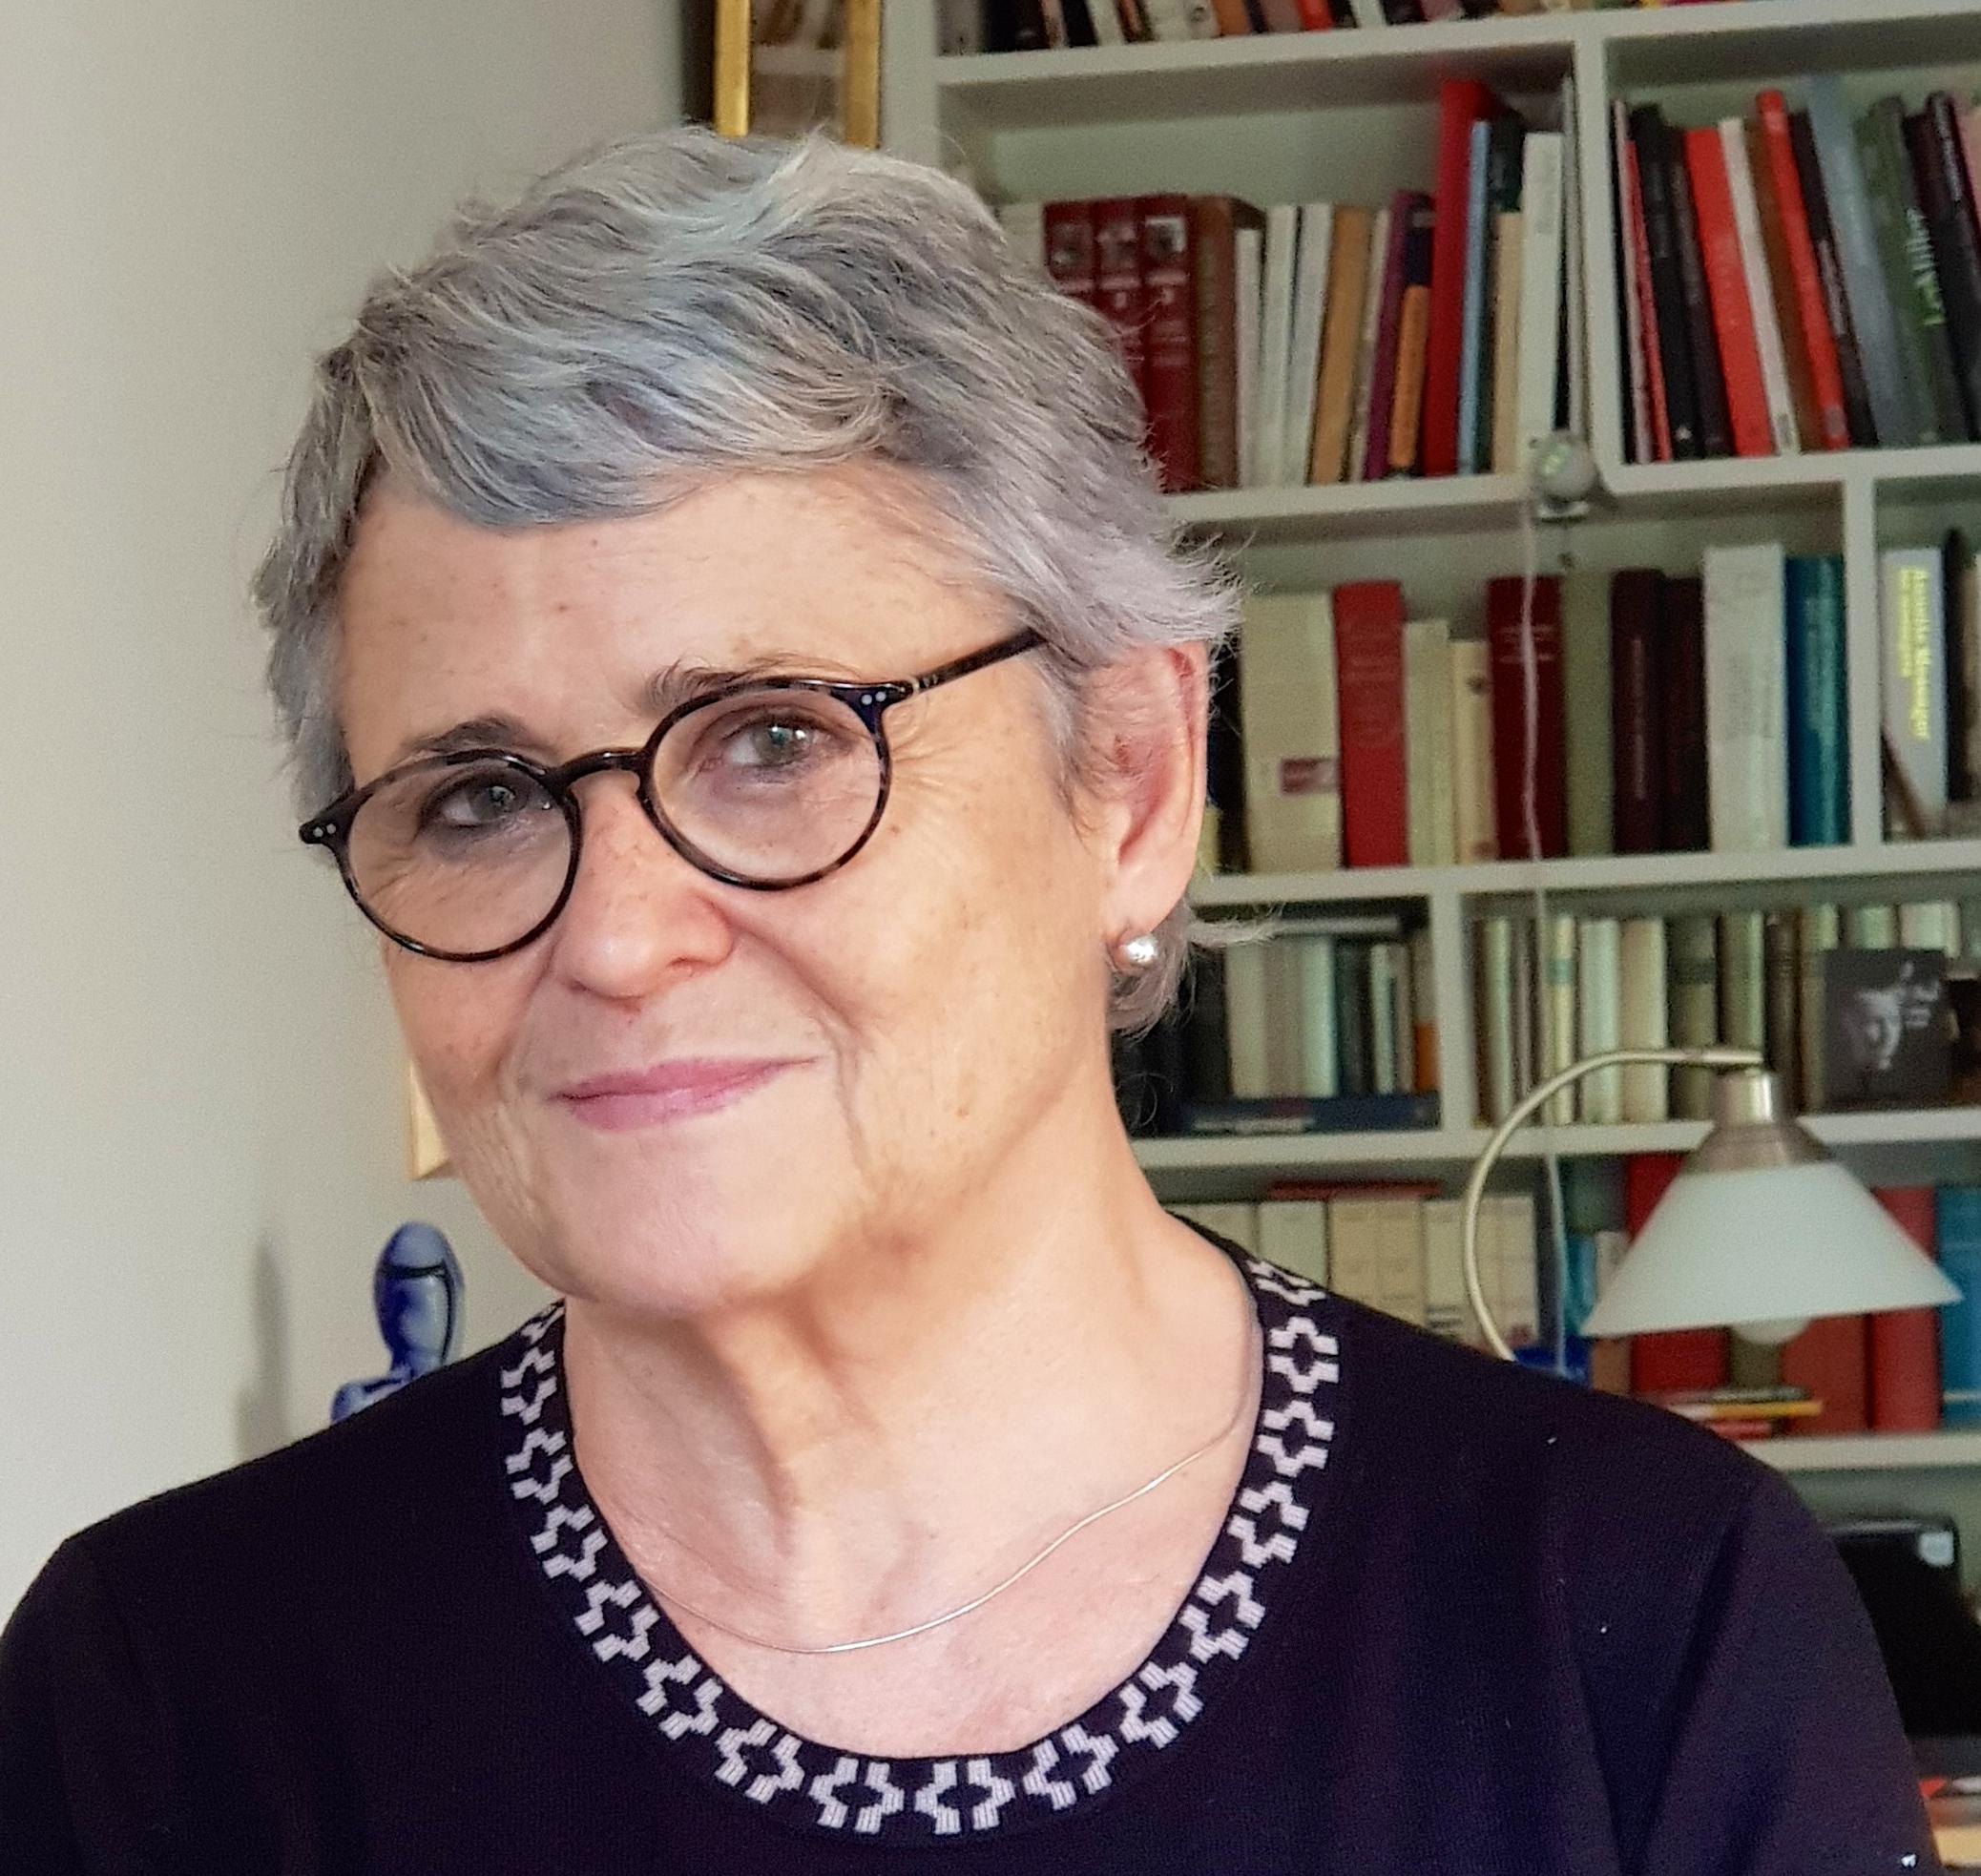 Geneviève Fraisse in 2017